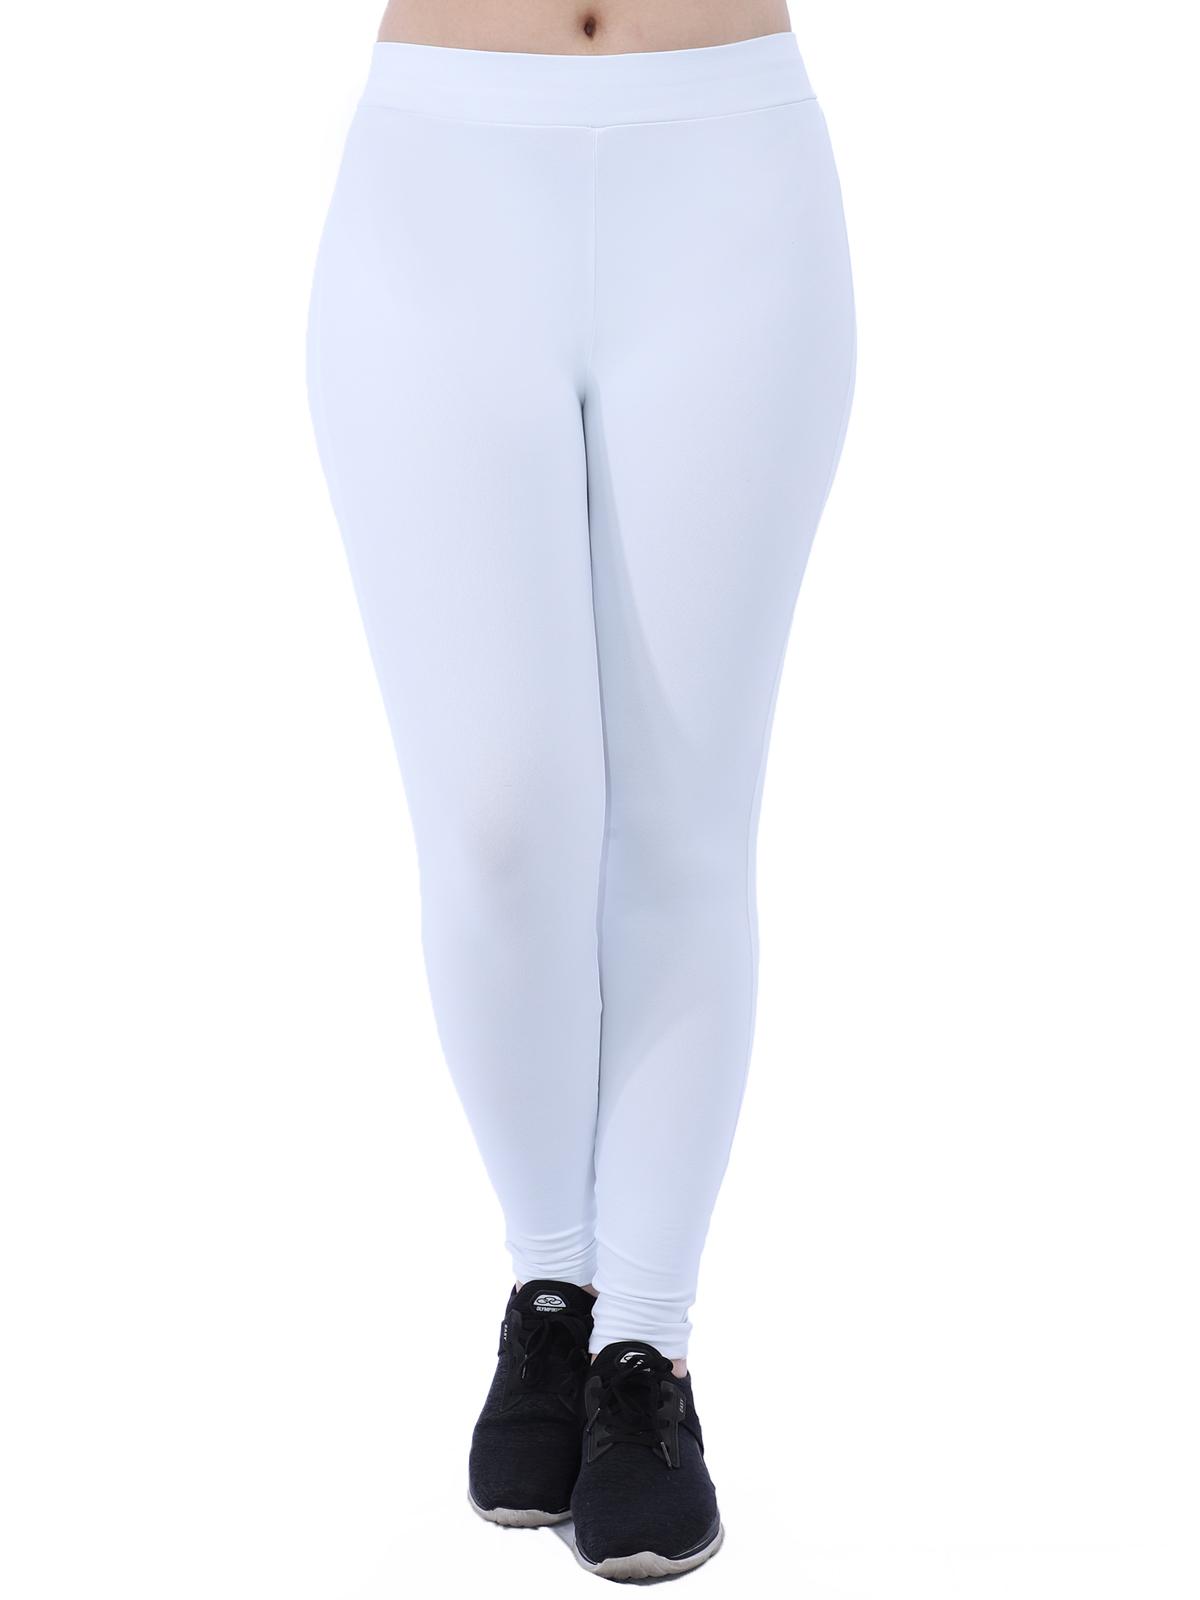 Calça Fusô Legging Fitness Feminina Academia Branco